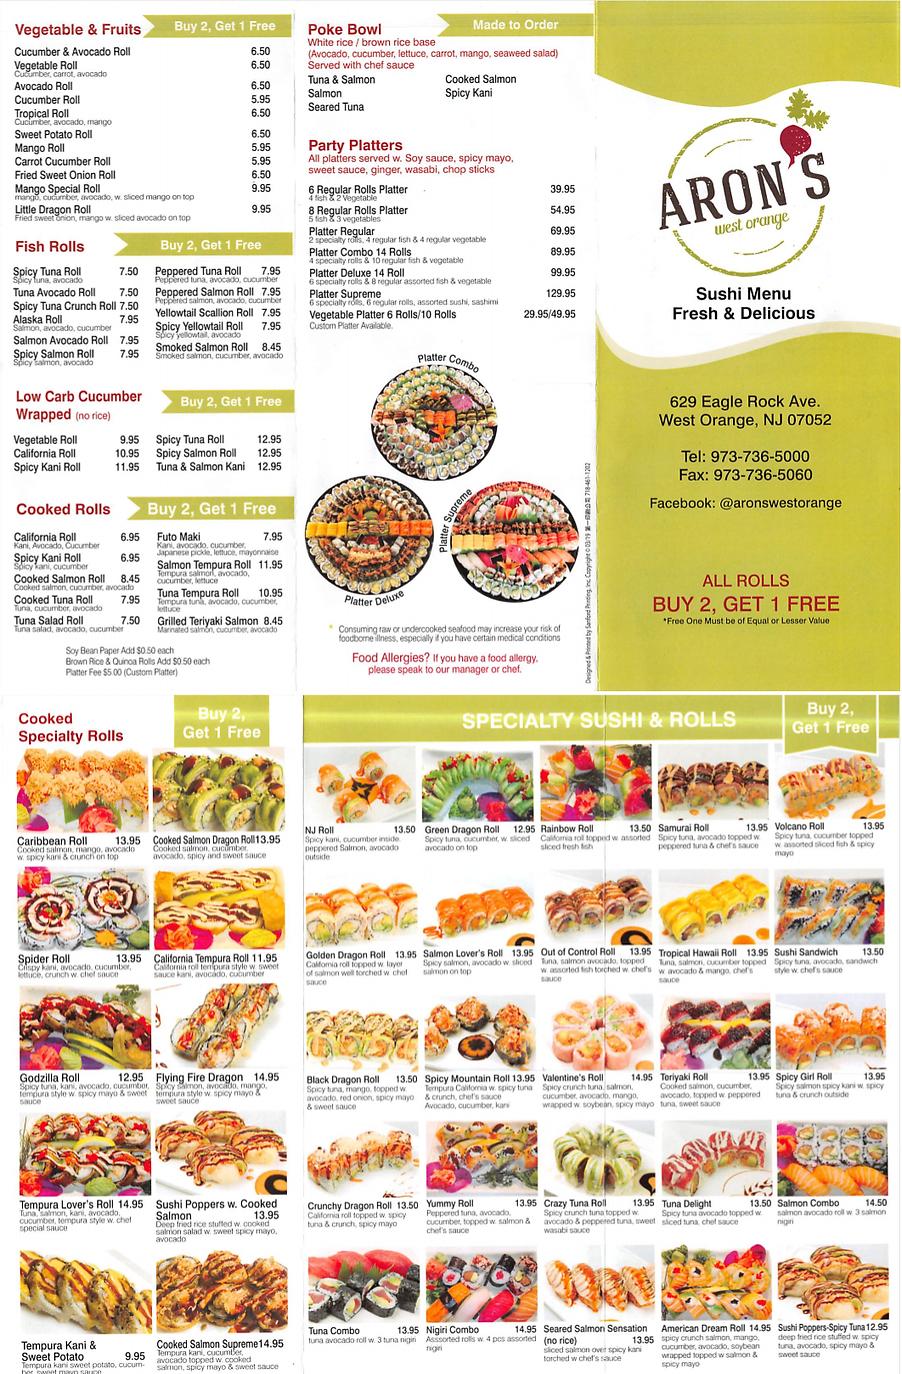 Aron's Sushi Menu JPEG.png